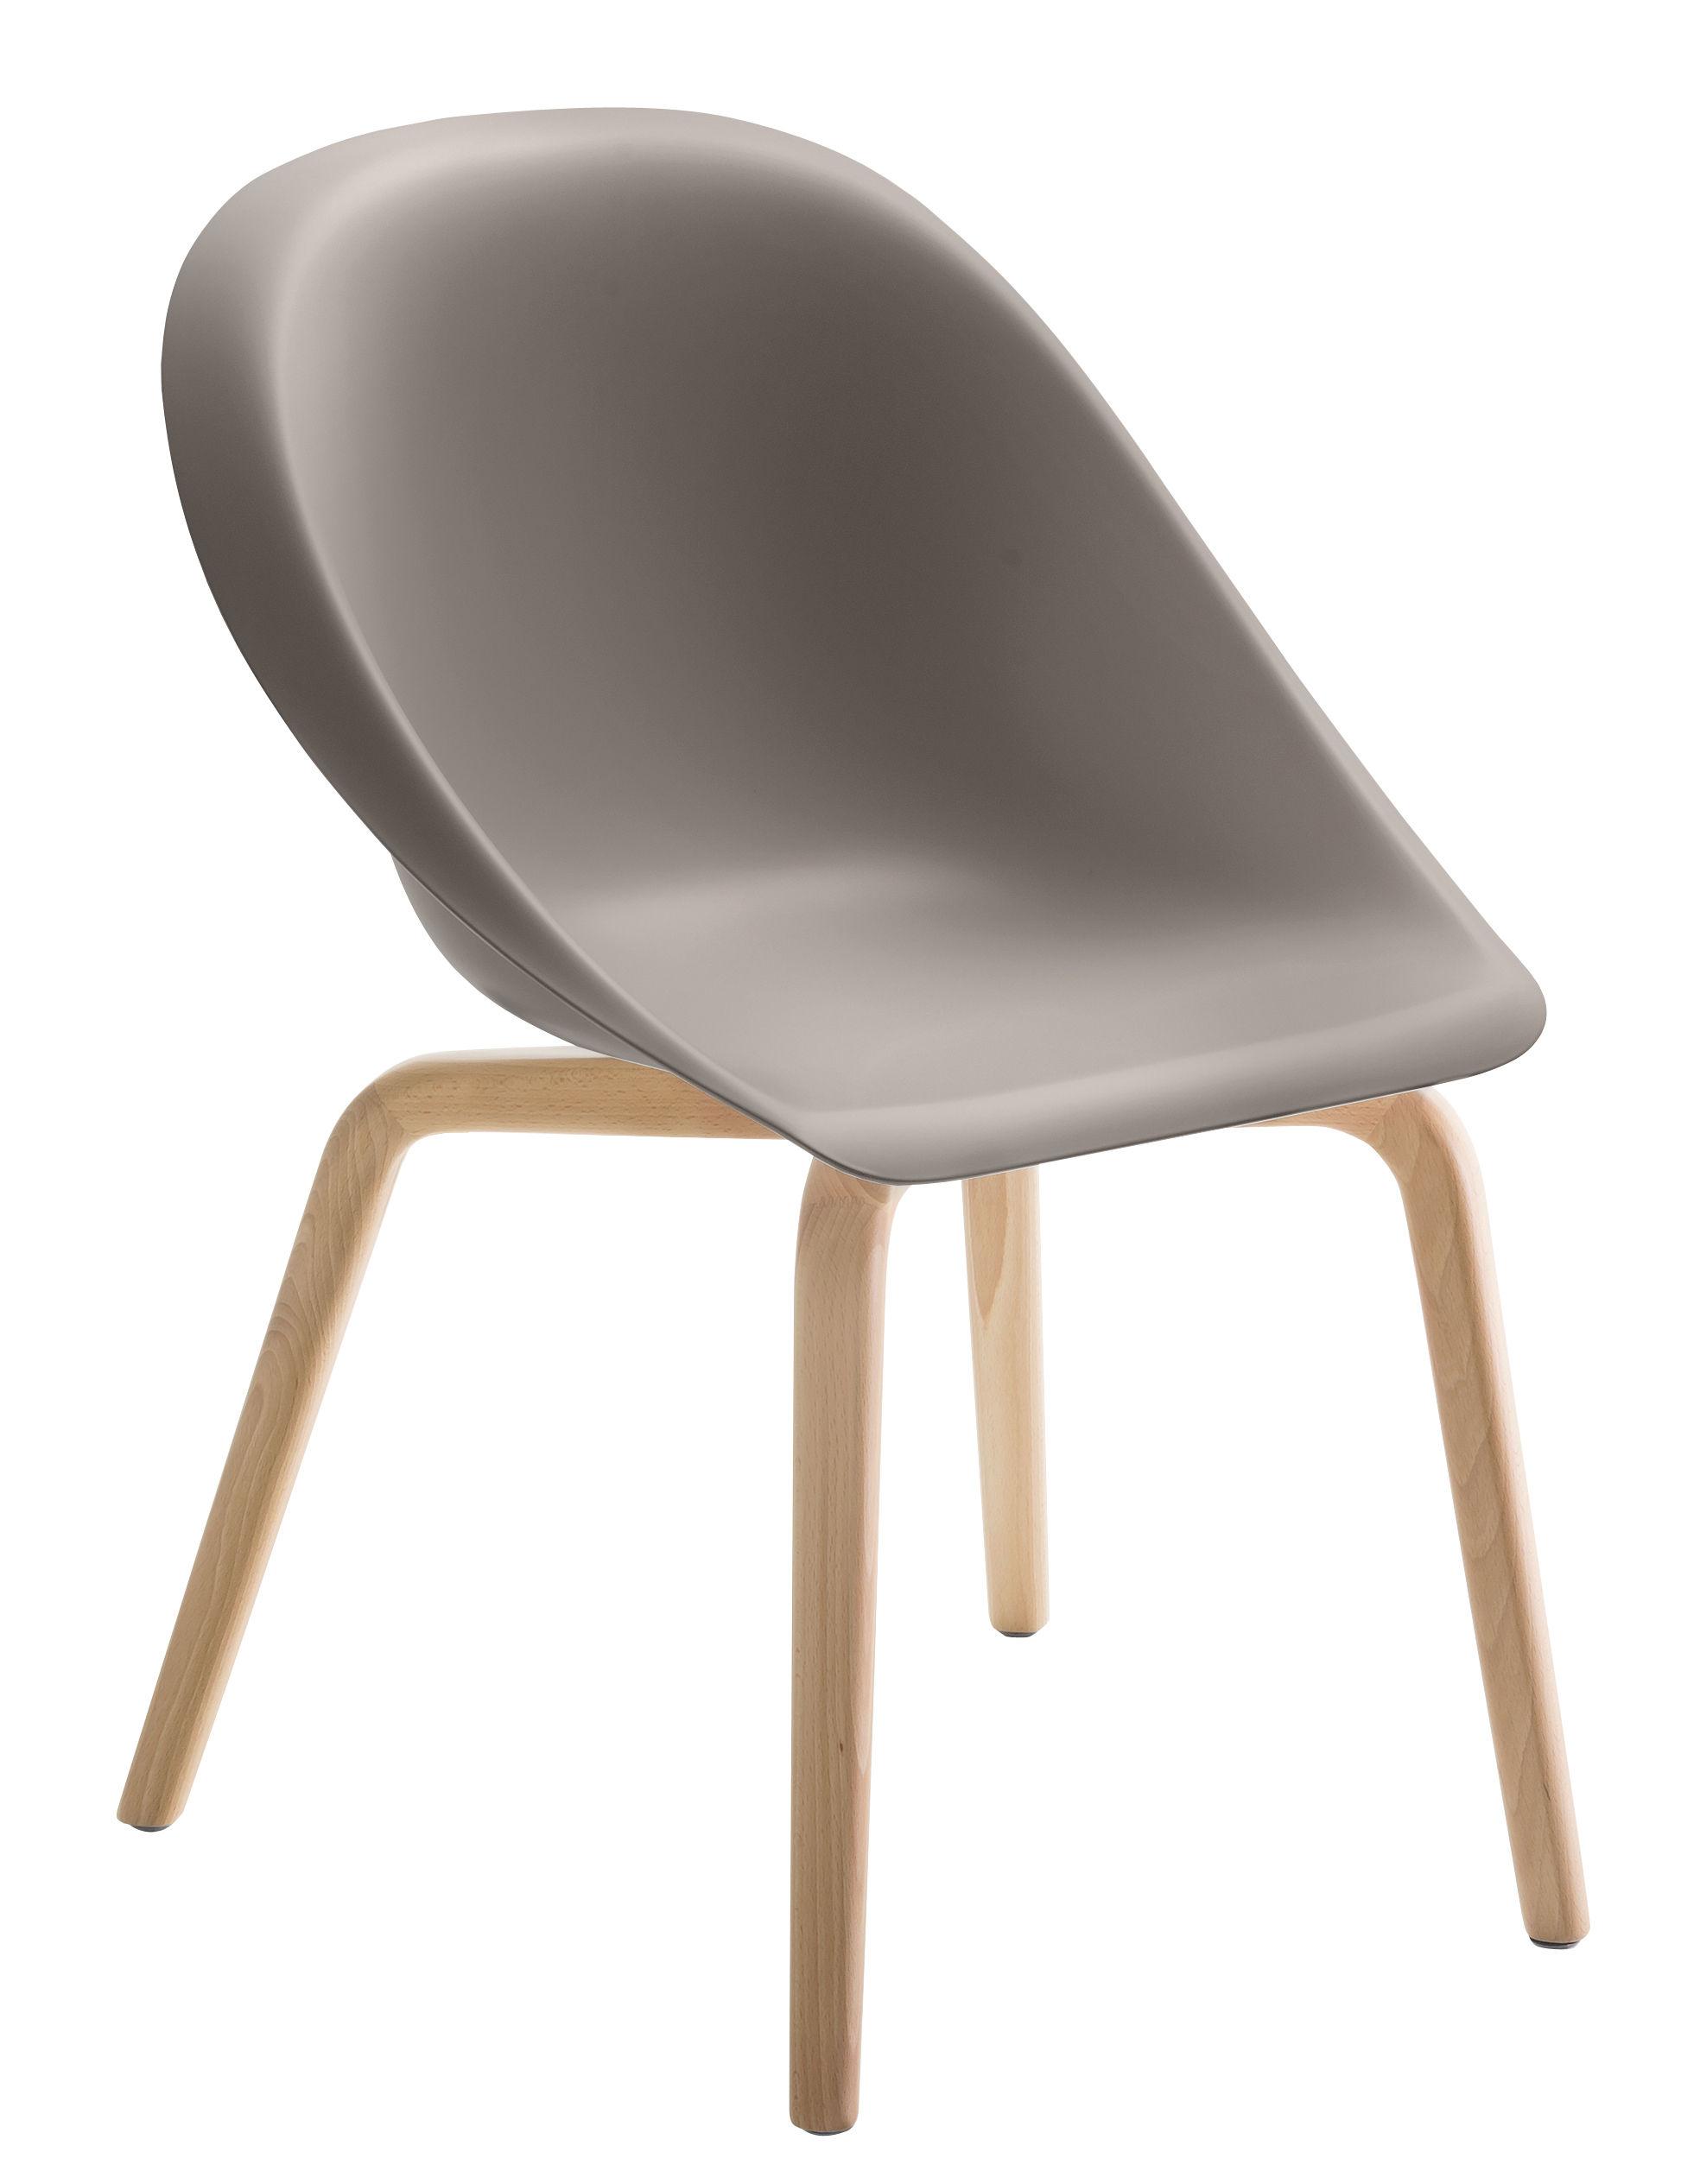 Furniture - Chairs - Hoop Armchair - Wood legs by B-LINE - Dove grey / Wood - Natural beechwood, Polyurethane